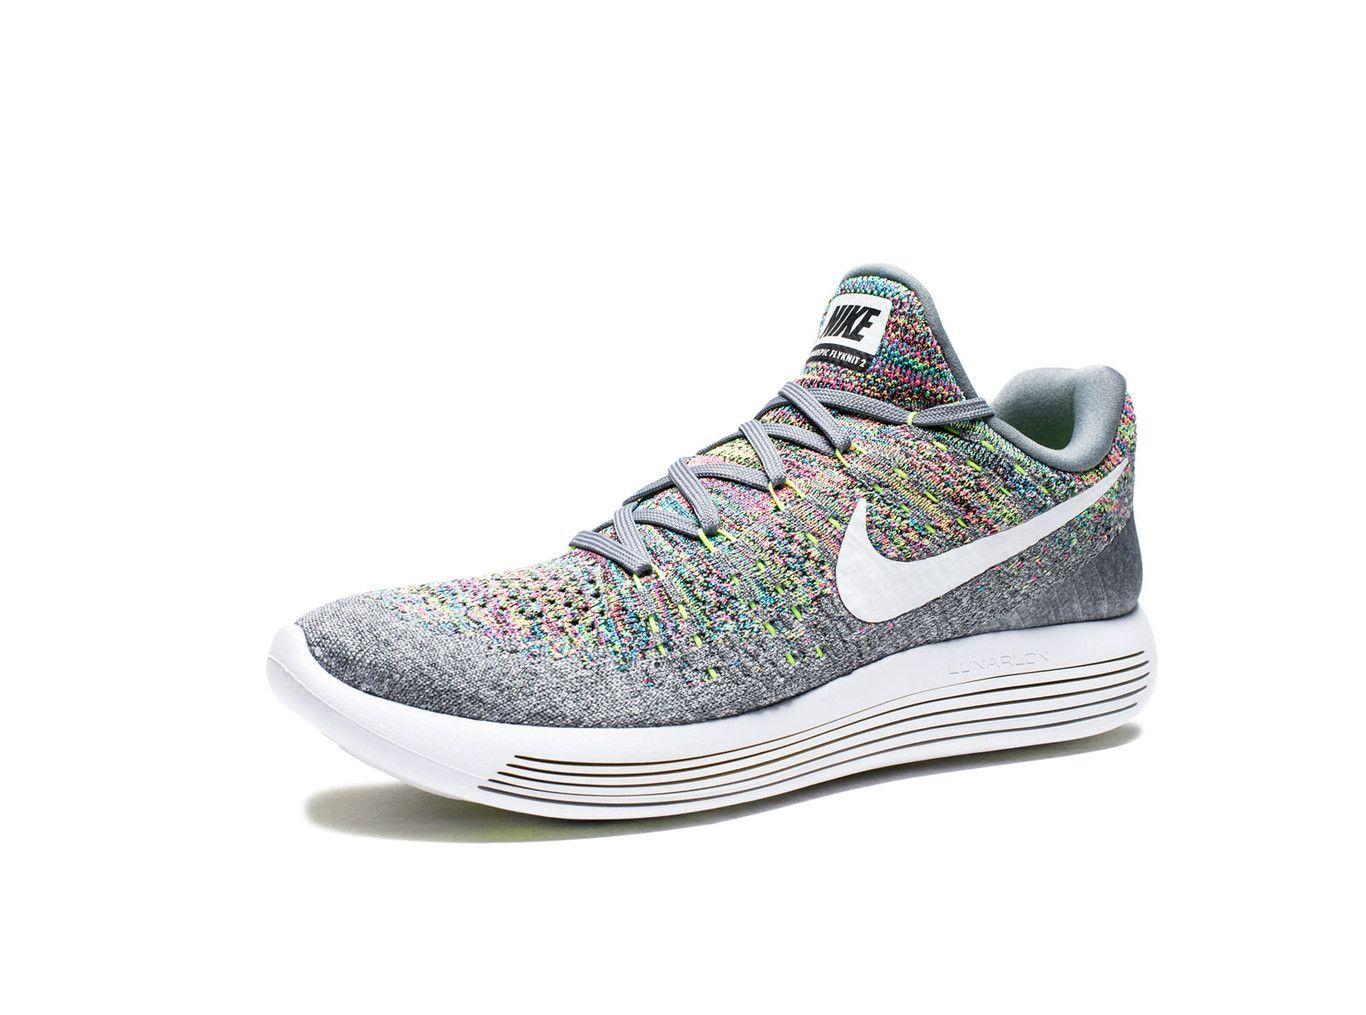 separation shoes 7e2c7 89a03 ... nike lunarepic low flyknit 2 cool grey white volt blue glow